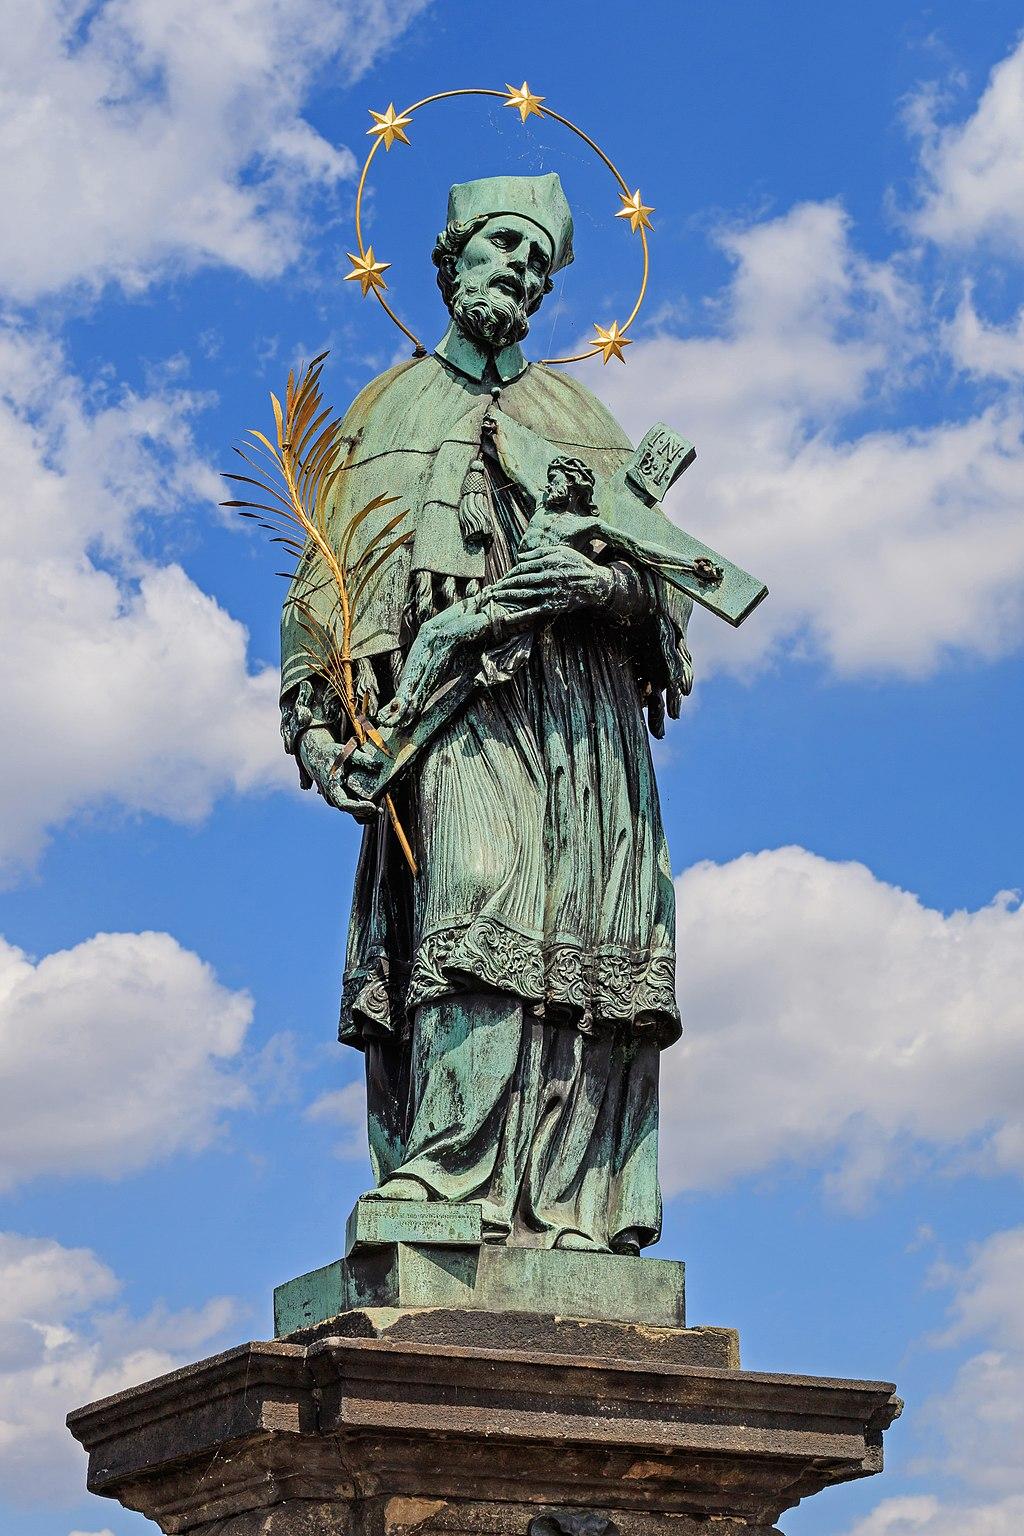 Prague 07-2016 Charles Bridge John of Nepomuk statue img1.jpg